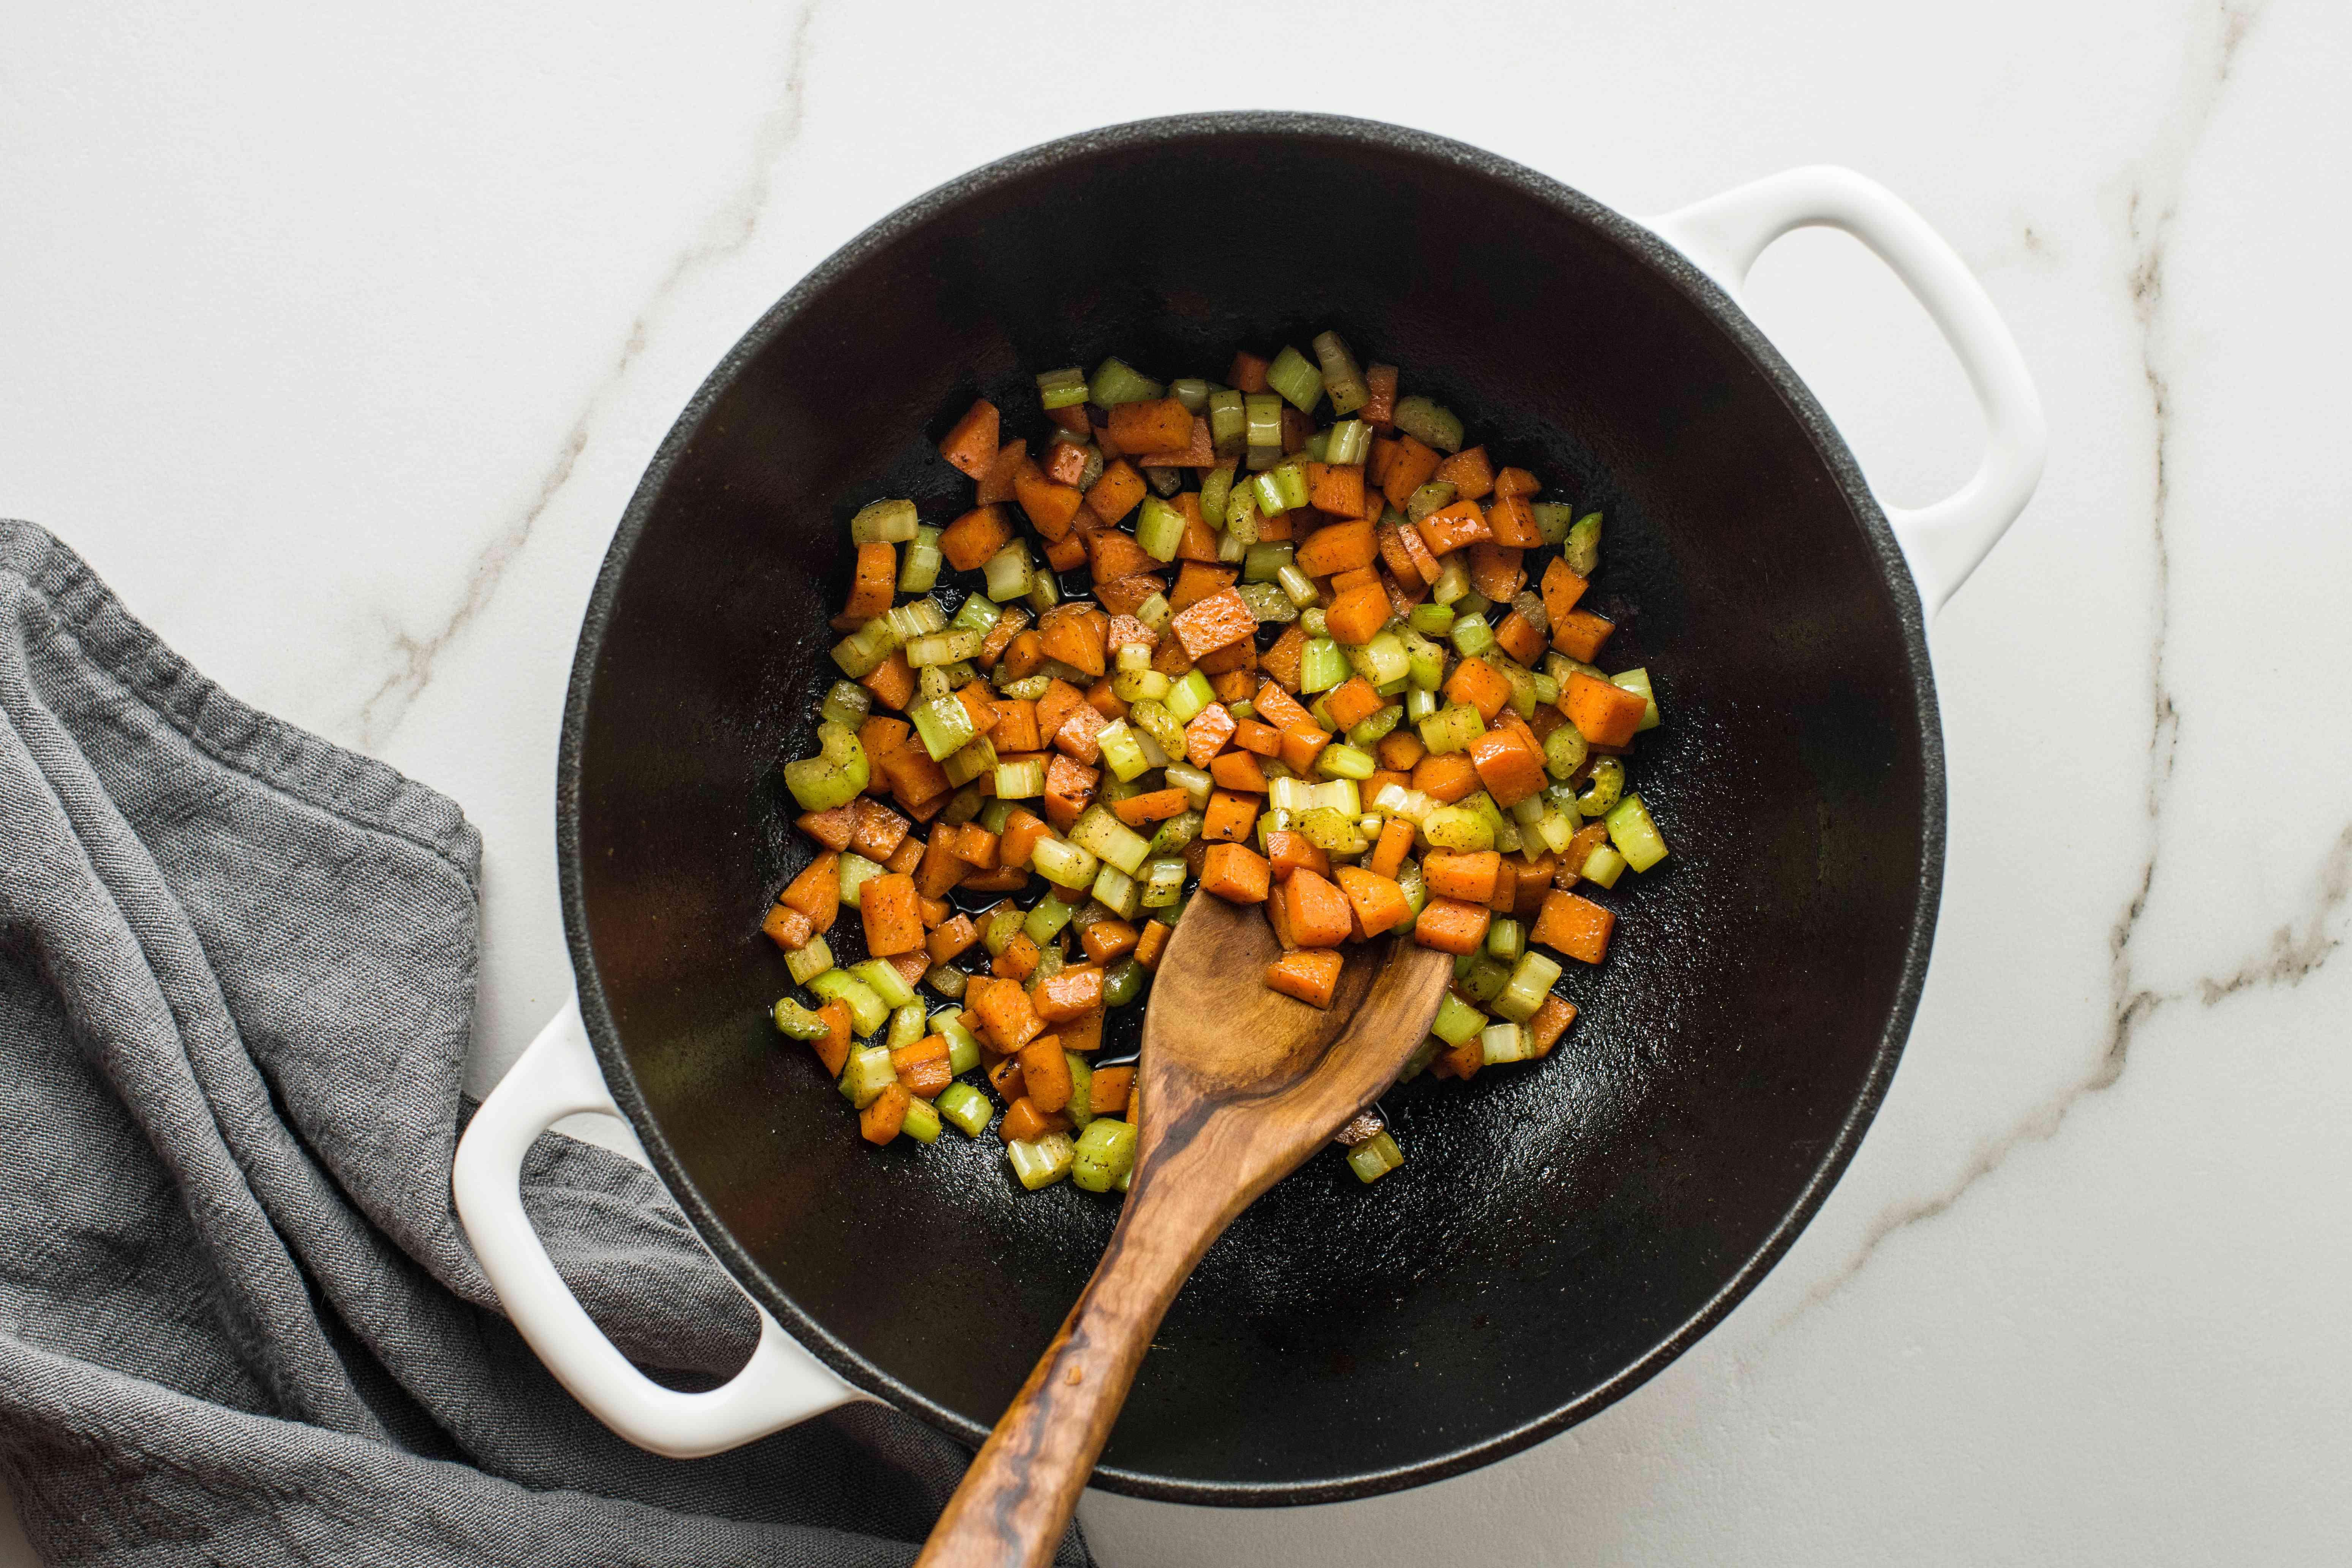 Add diced carrots